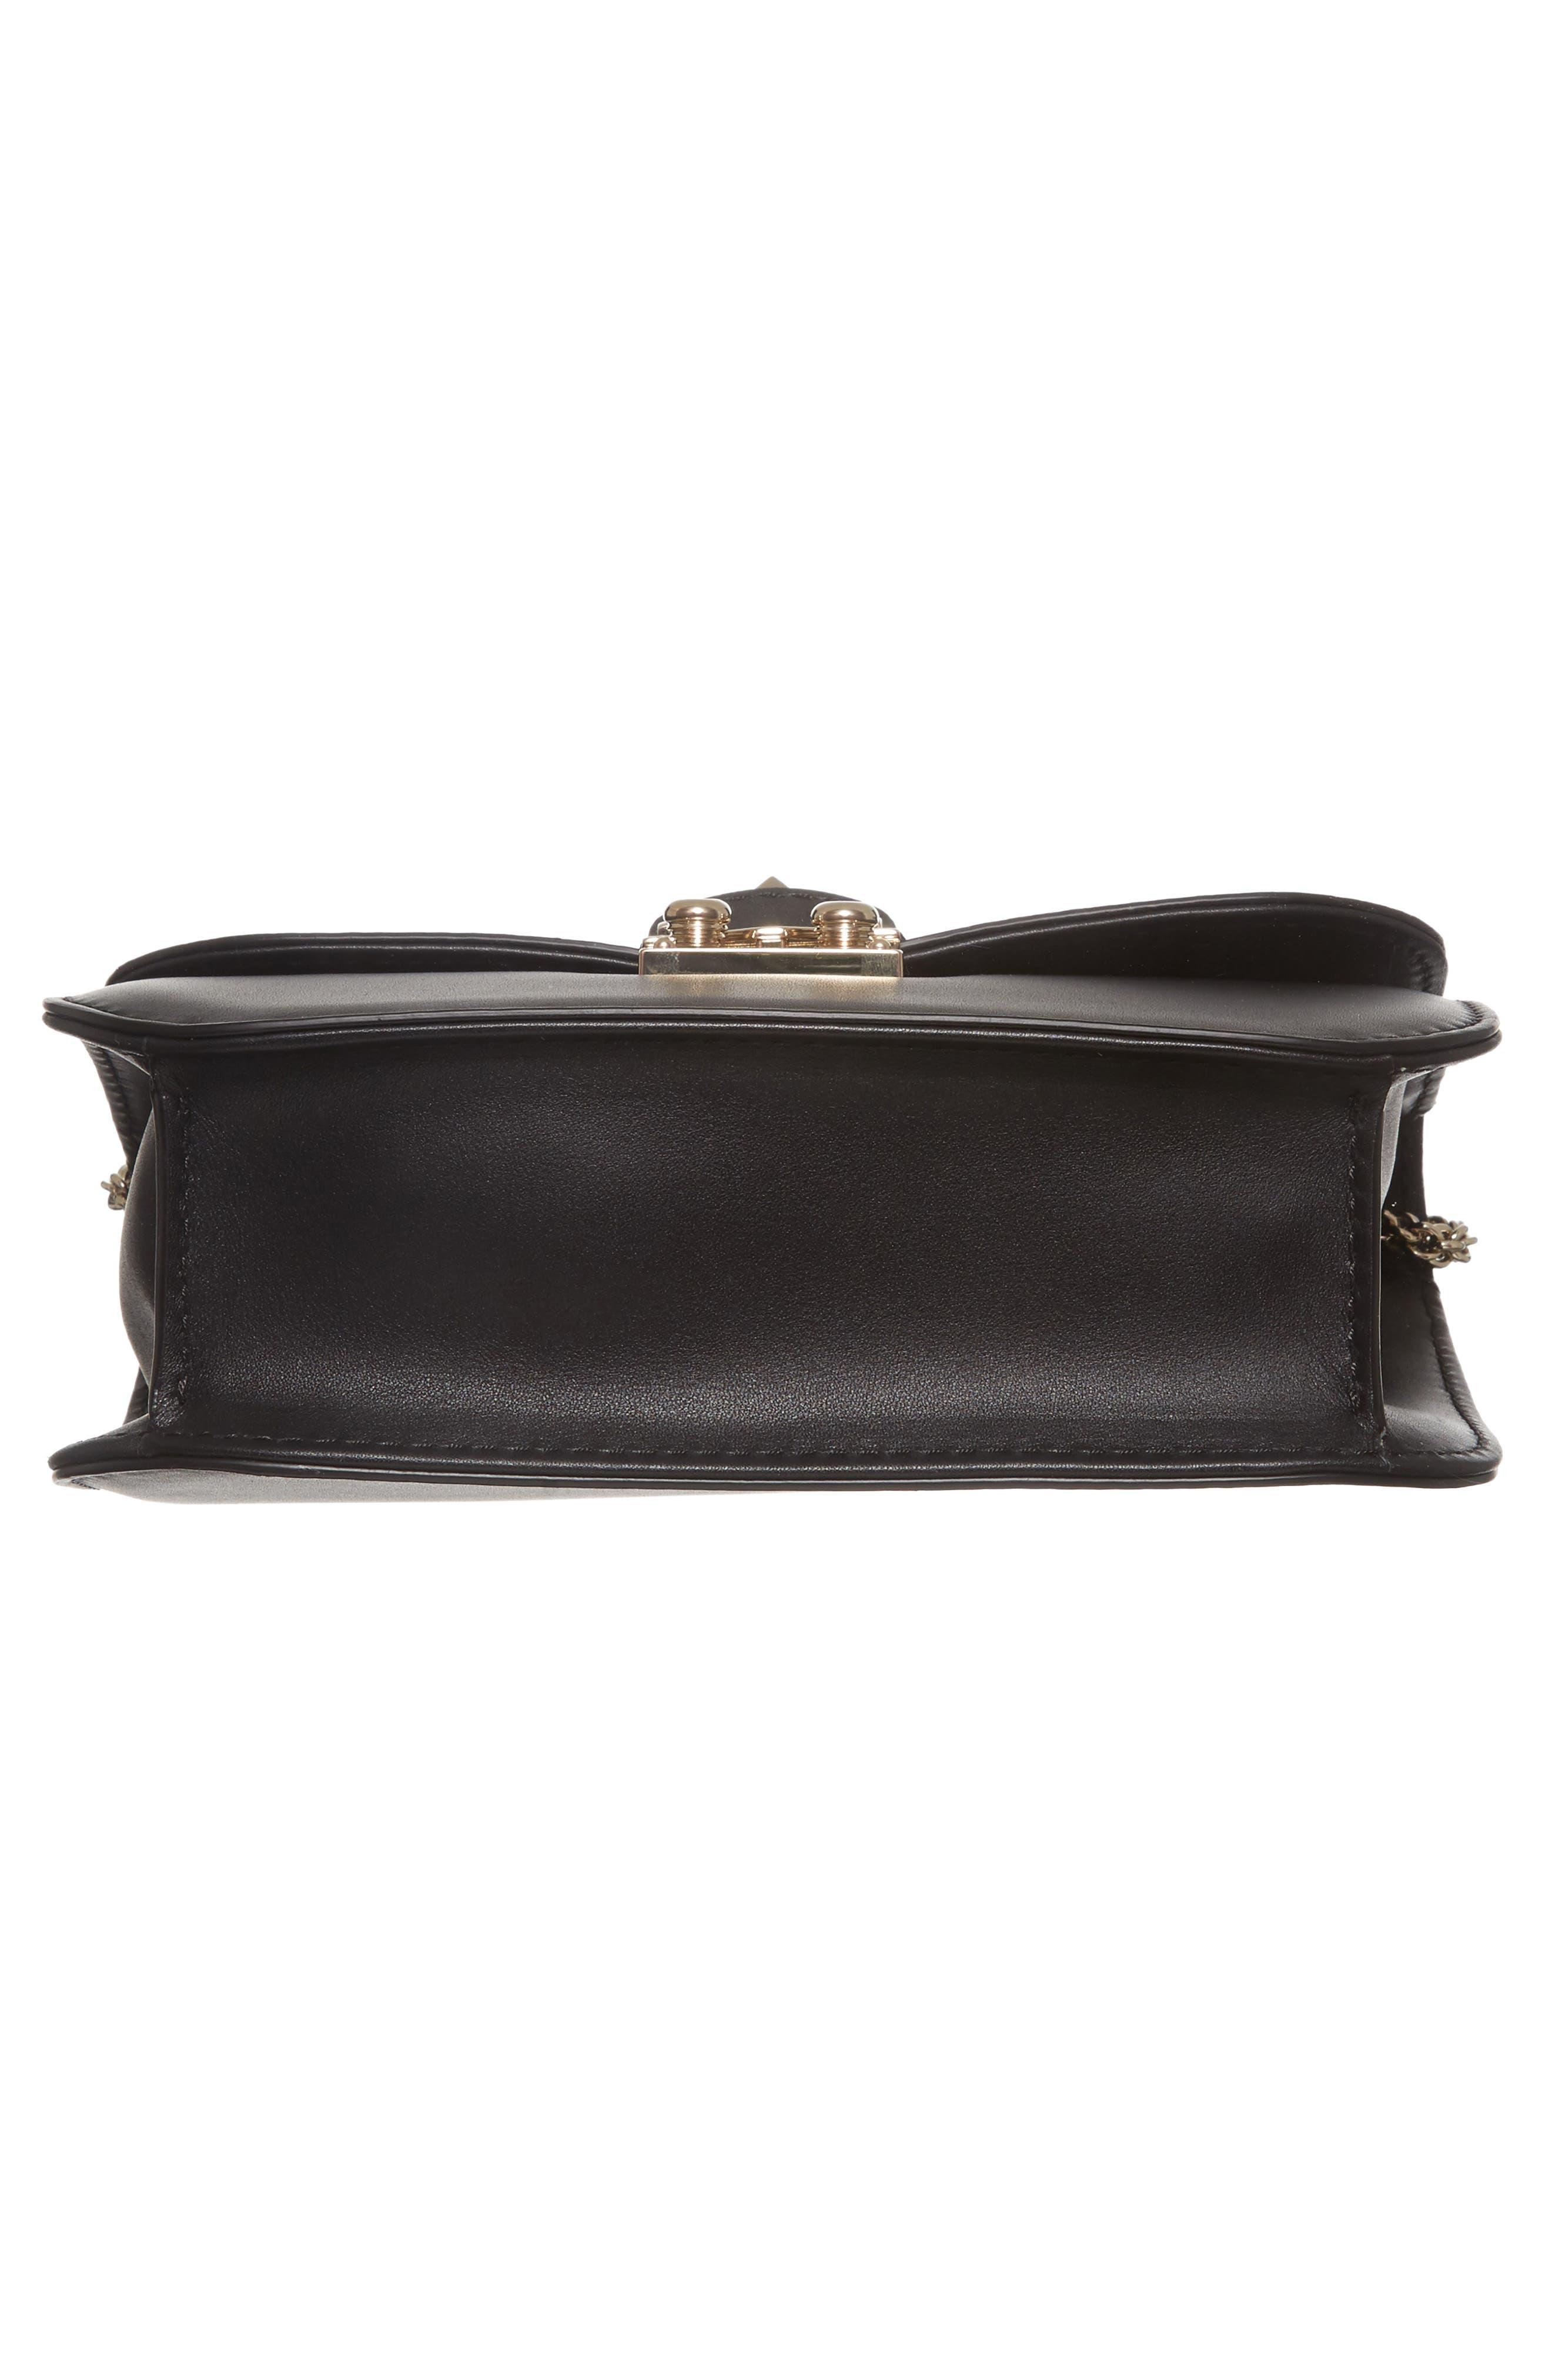 Small Lock Leather Crossbody Bag,                             Alternate thumbnail 6, color,                             NERO